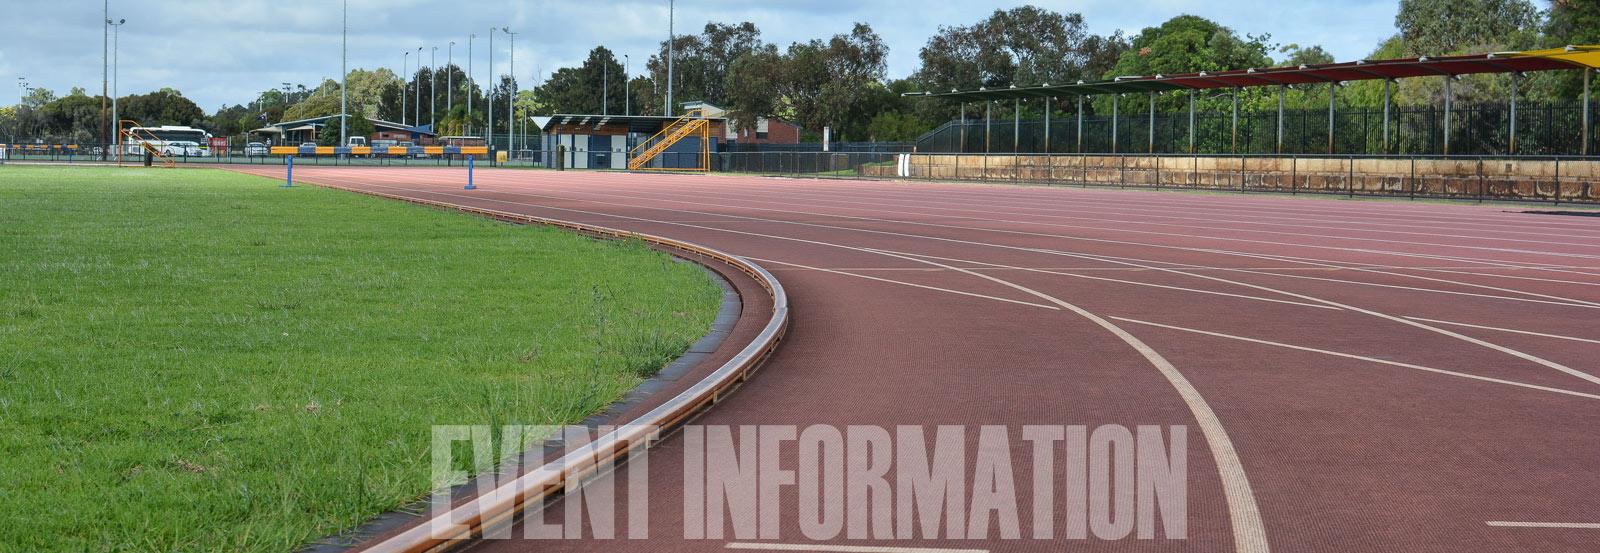 Event Information   Track Ultra WA